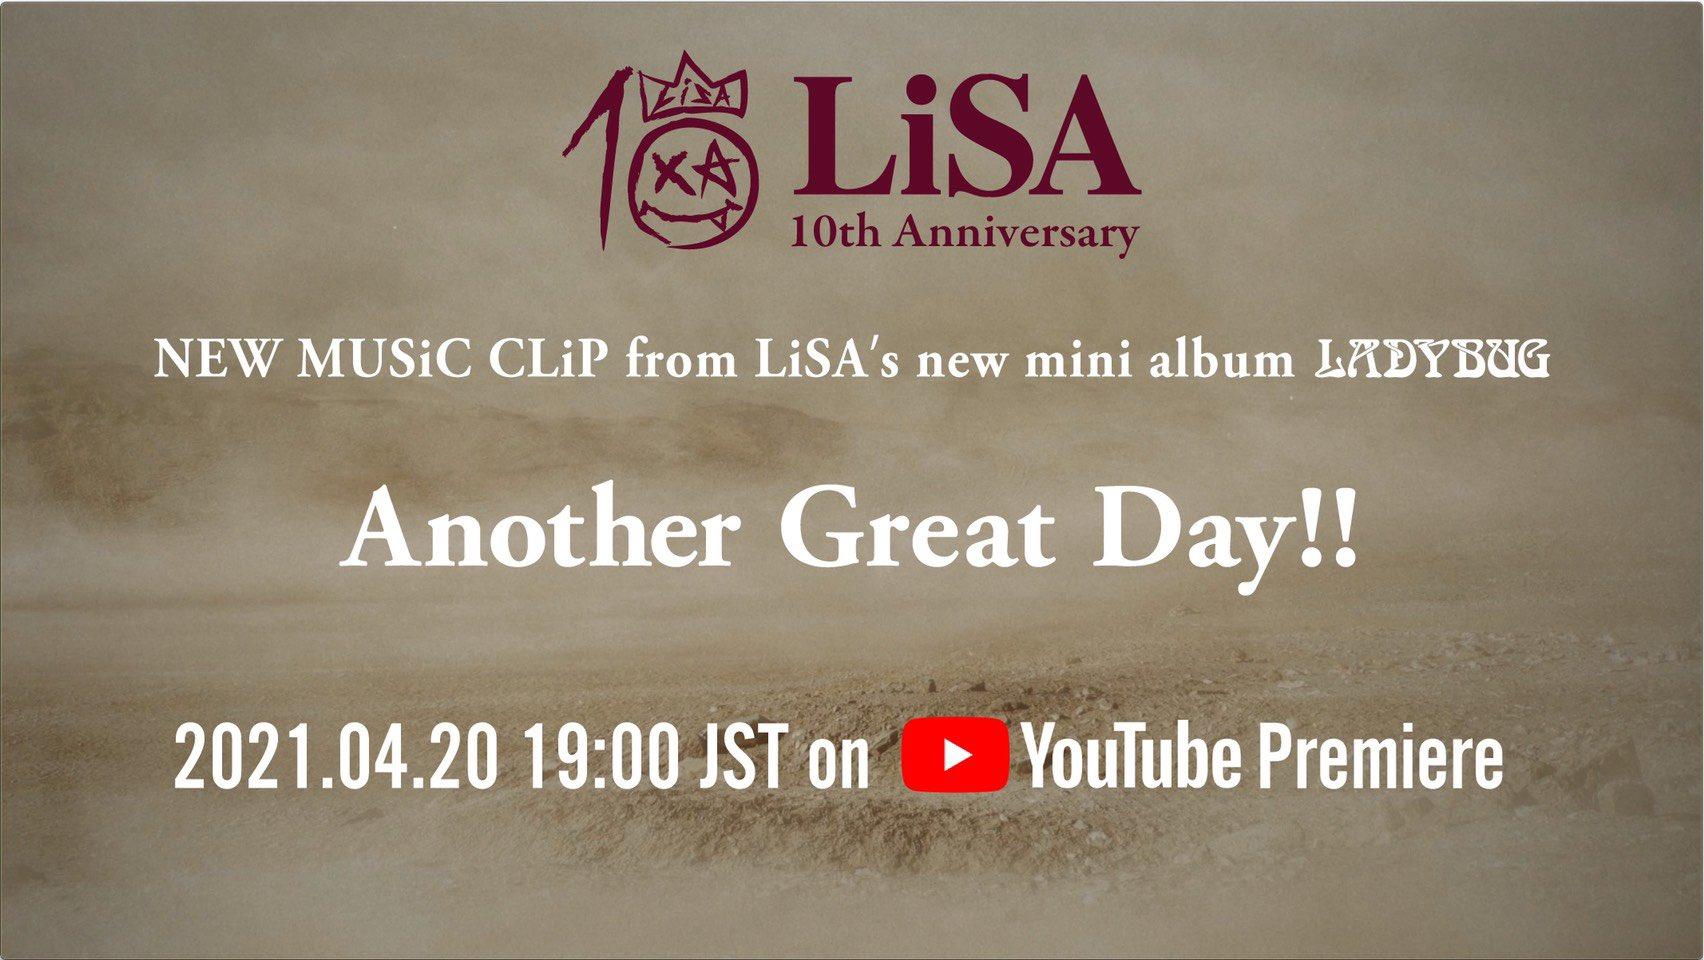 B'z松本孝弘作編曲の新曲「Another Great Day!!」のミュージックビデオ告知